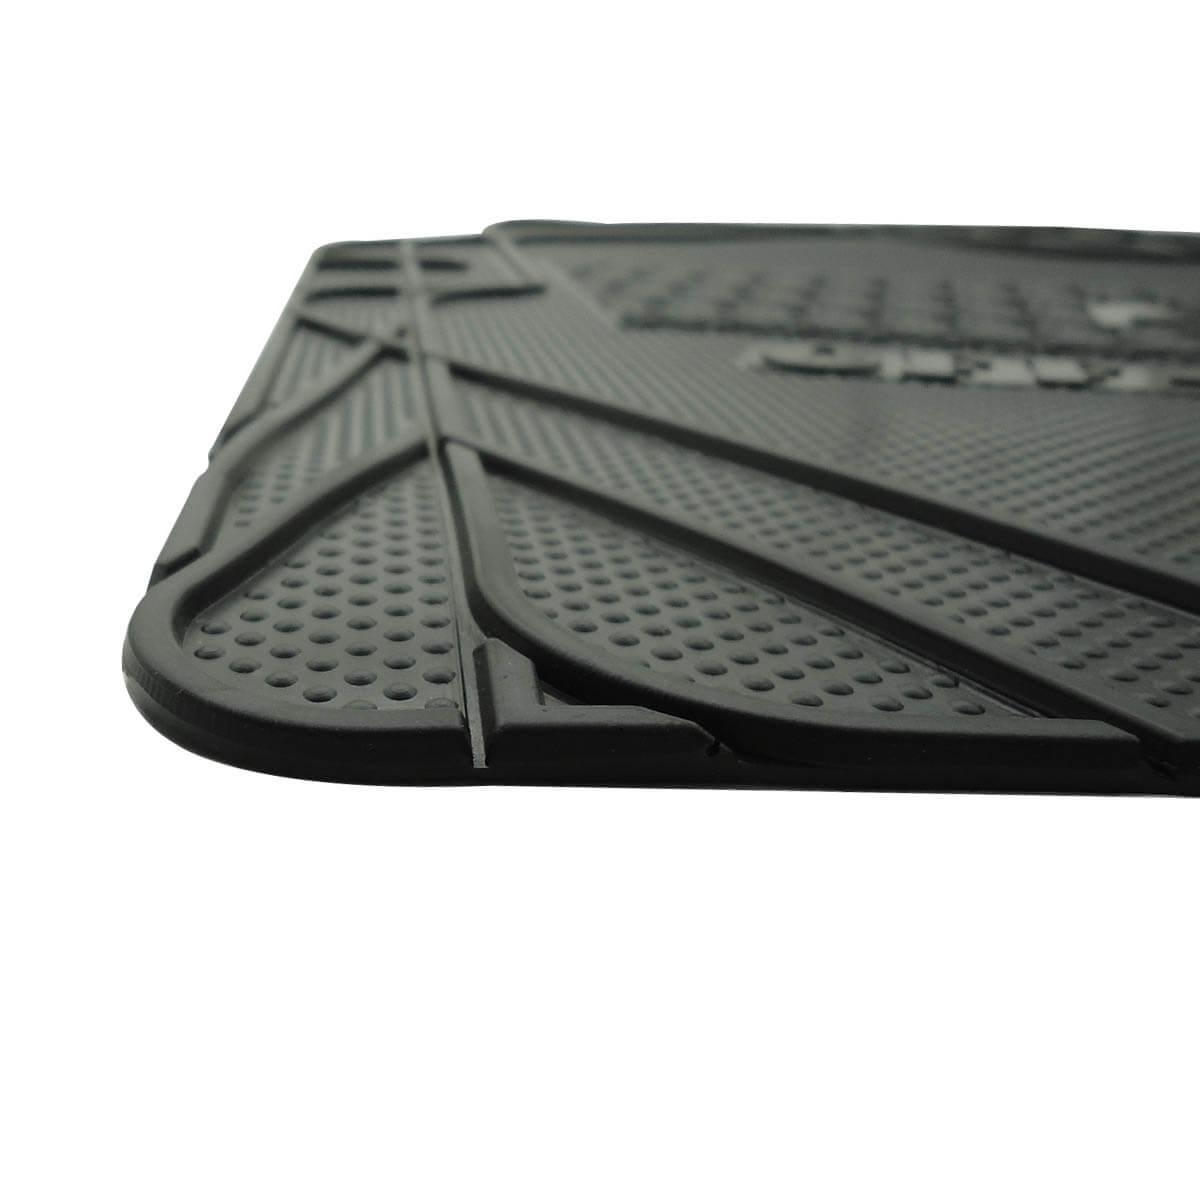 Tapete personalizado PVC flexível Duster 2012 a 2017 ou Duster Oroch 2016 a 2018